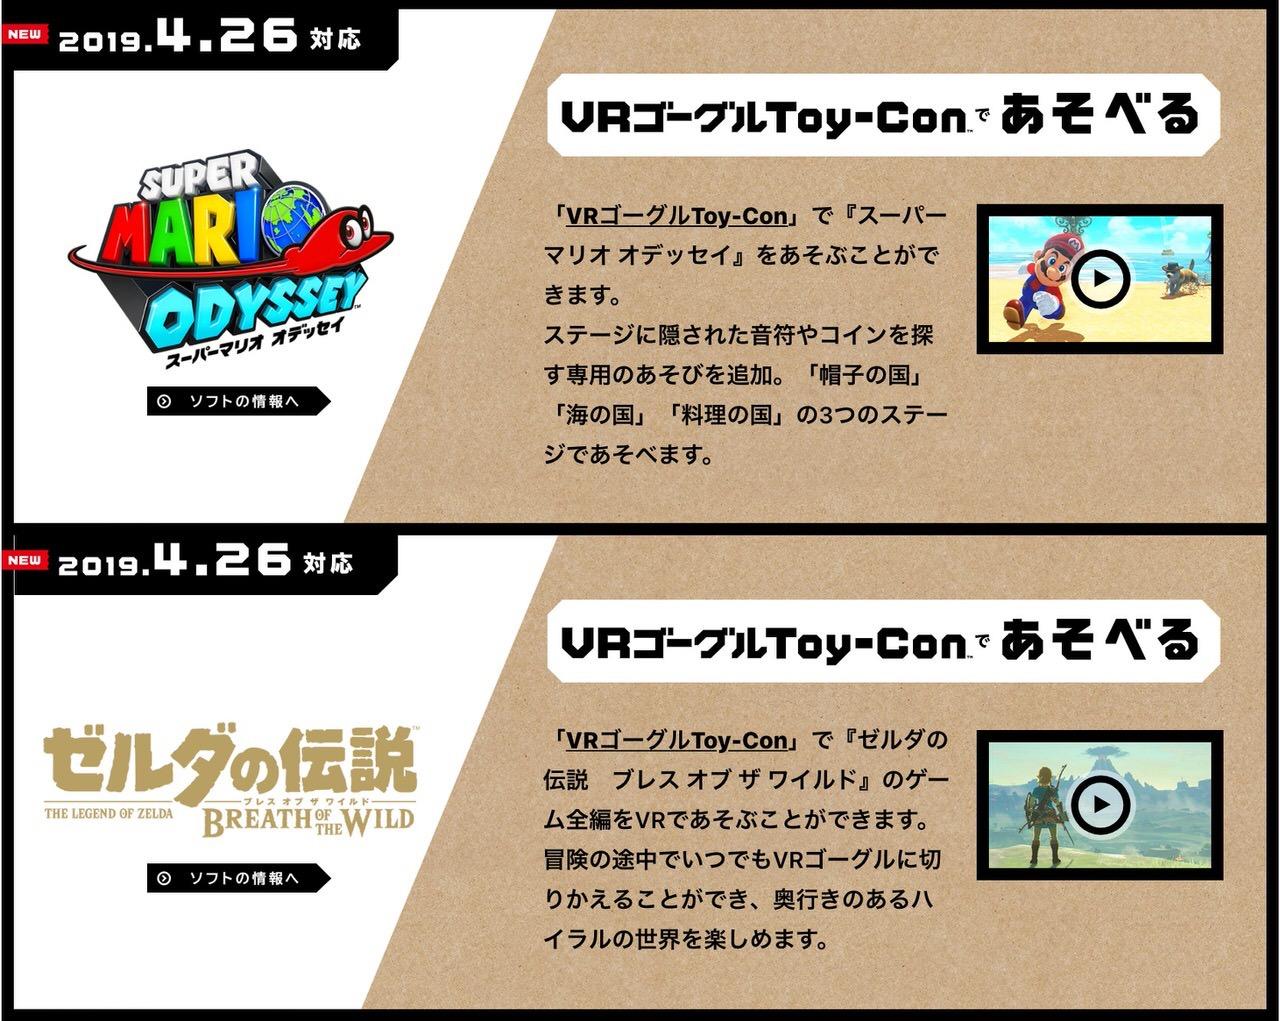 【VRゴーグルToy-Con】「スーパーマリオ オデッセイ」「ゼルダの伝説 ブレス オブ ザ ワイルド」に対応